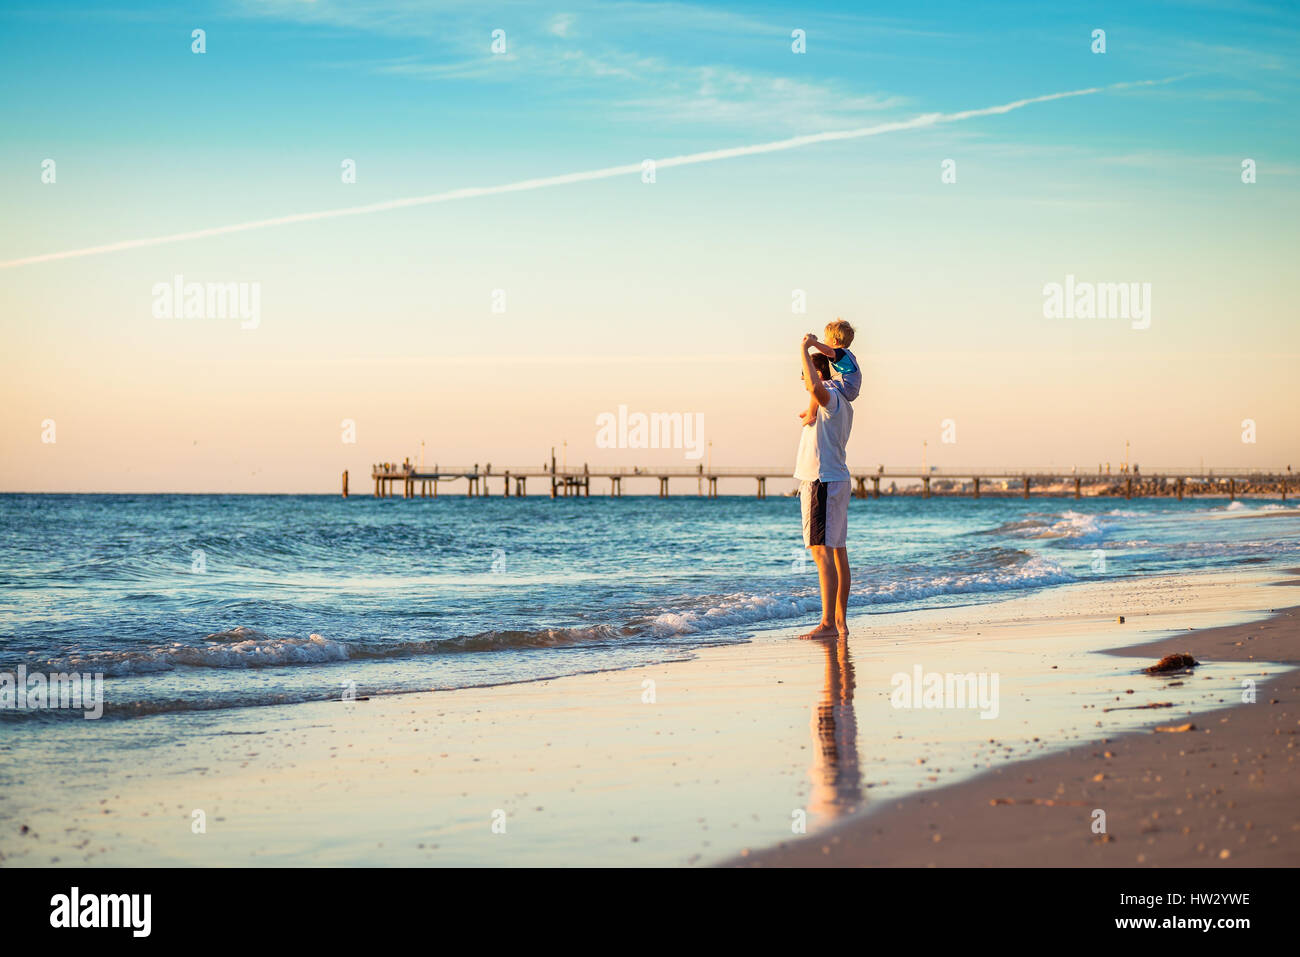 Hijo de padre dando piggyback paseo en playa Imagen De Stock